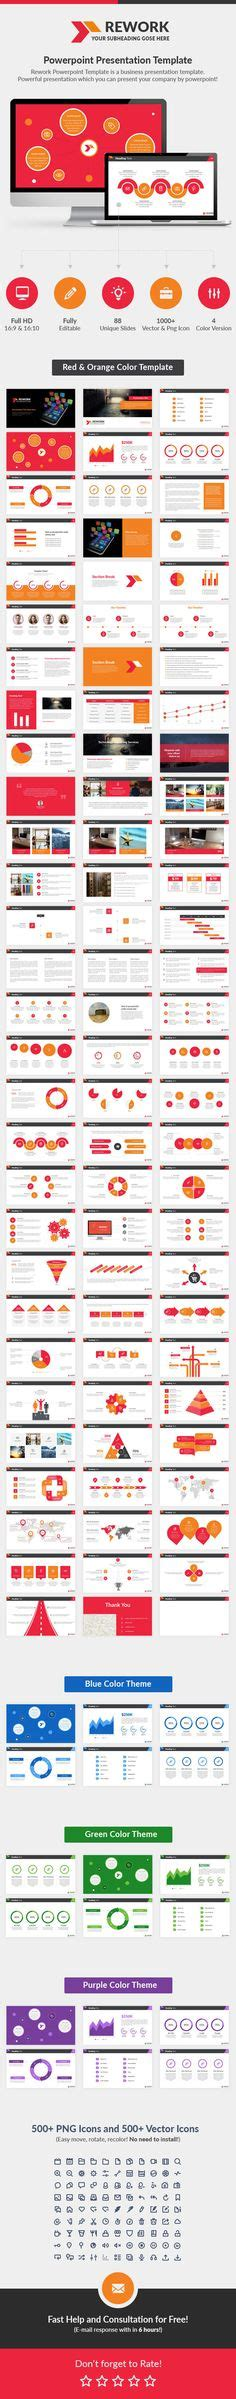 rework template business report powerpoint template powerpoint templates